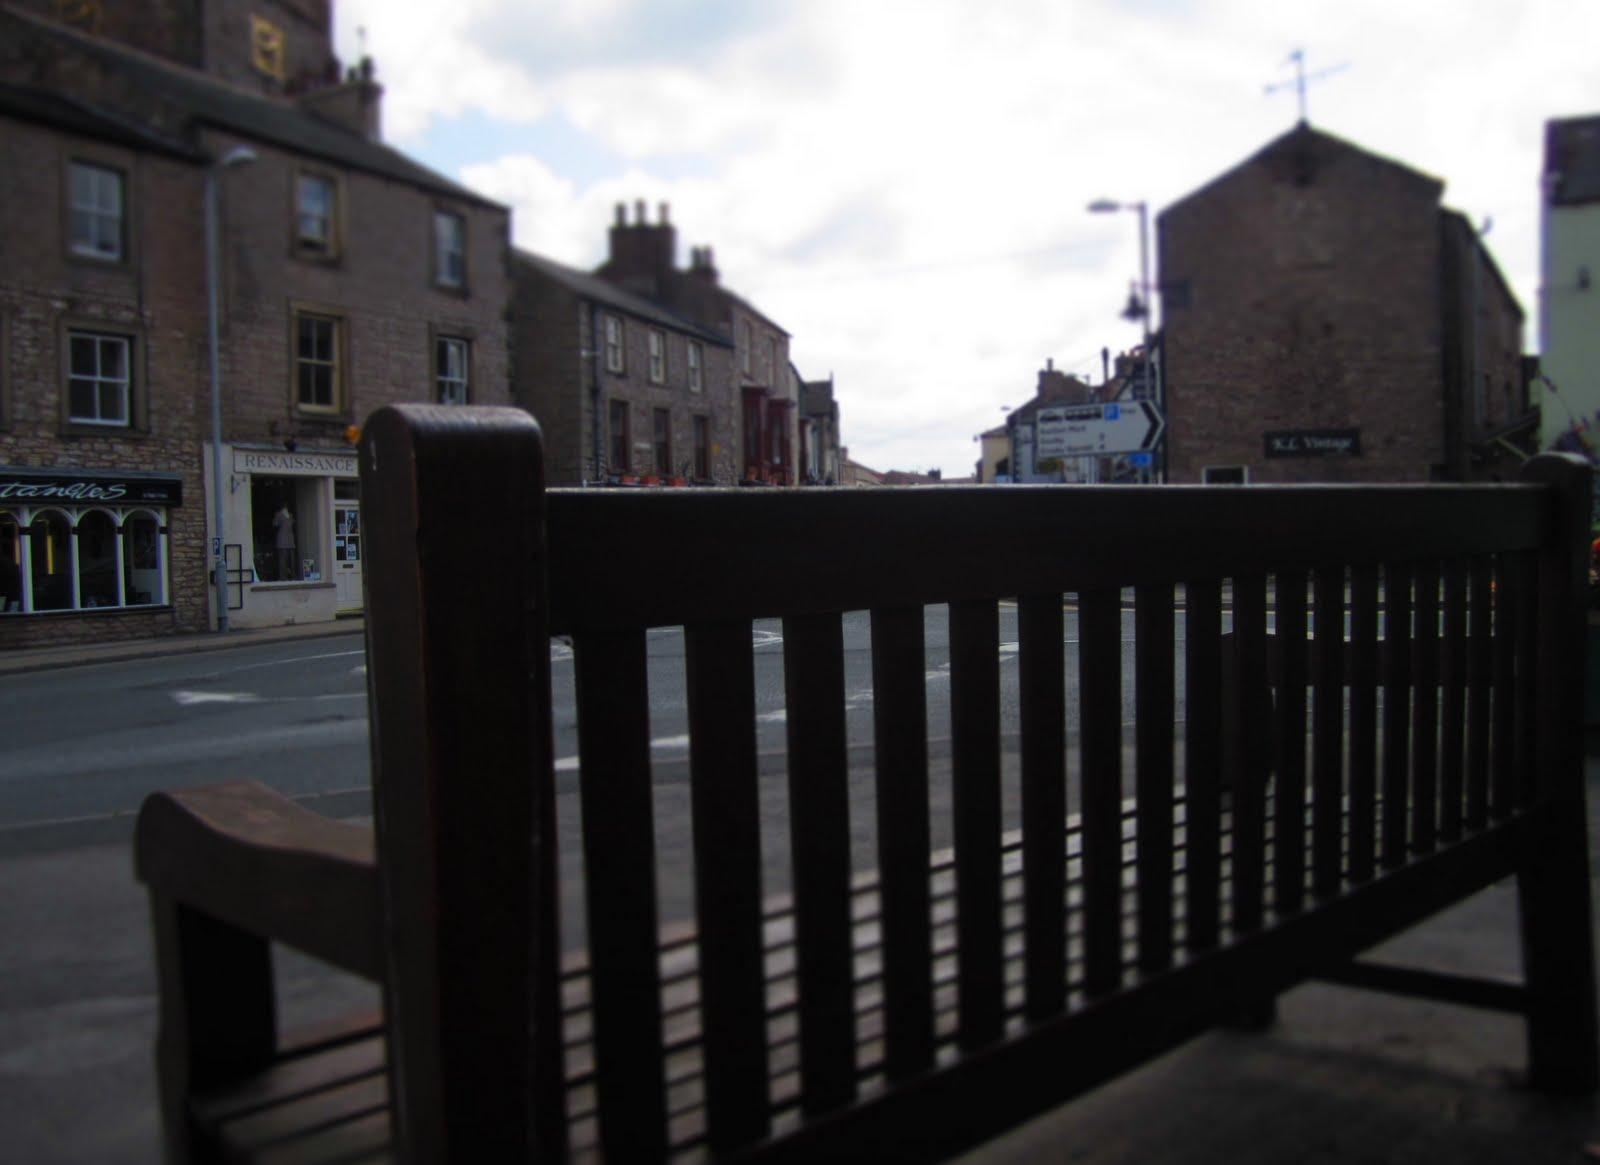 TravelMarx: Benches of the Wainwright Coast to Coast Walkstephentown town